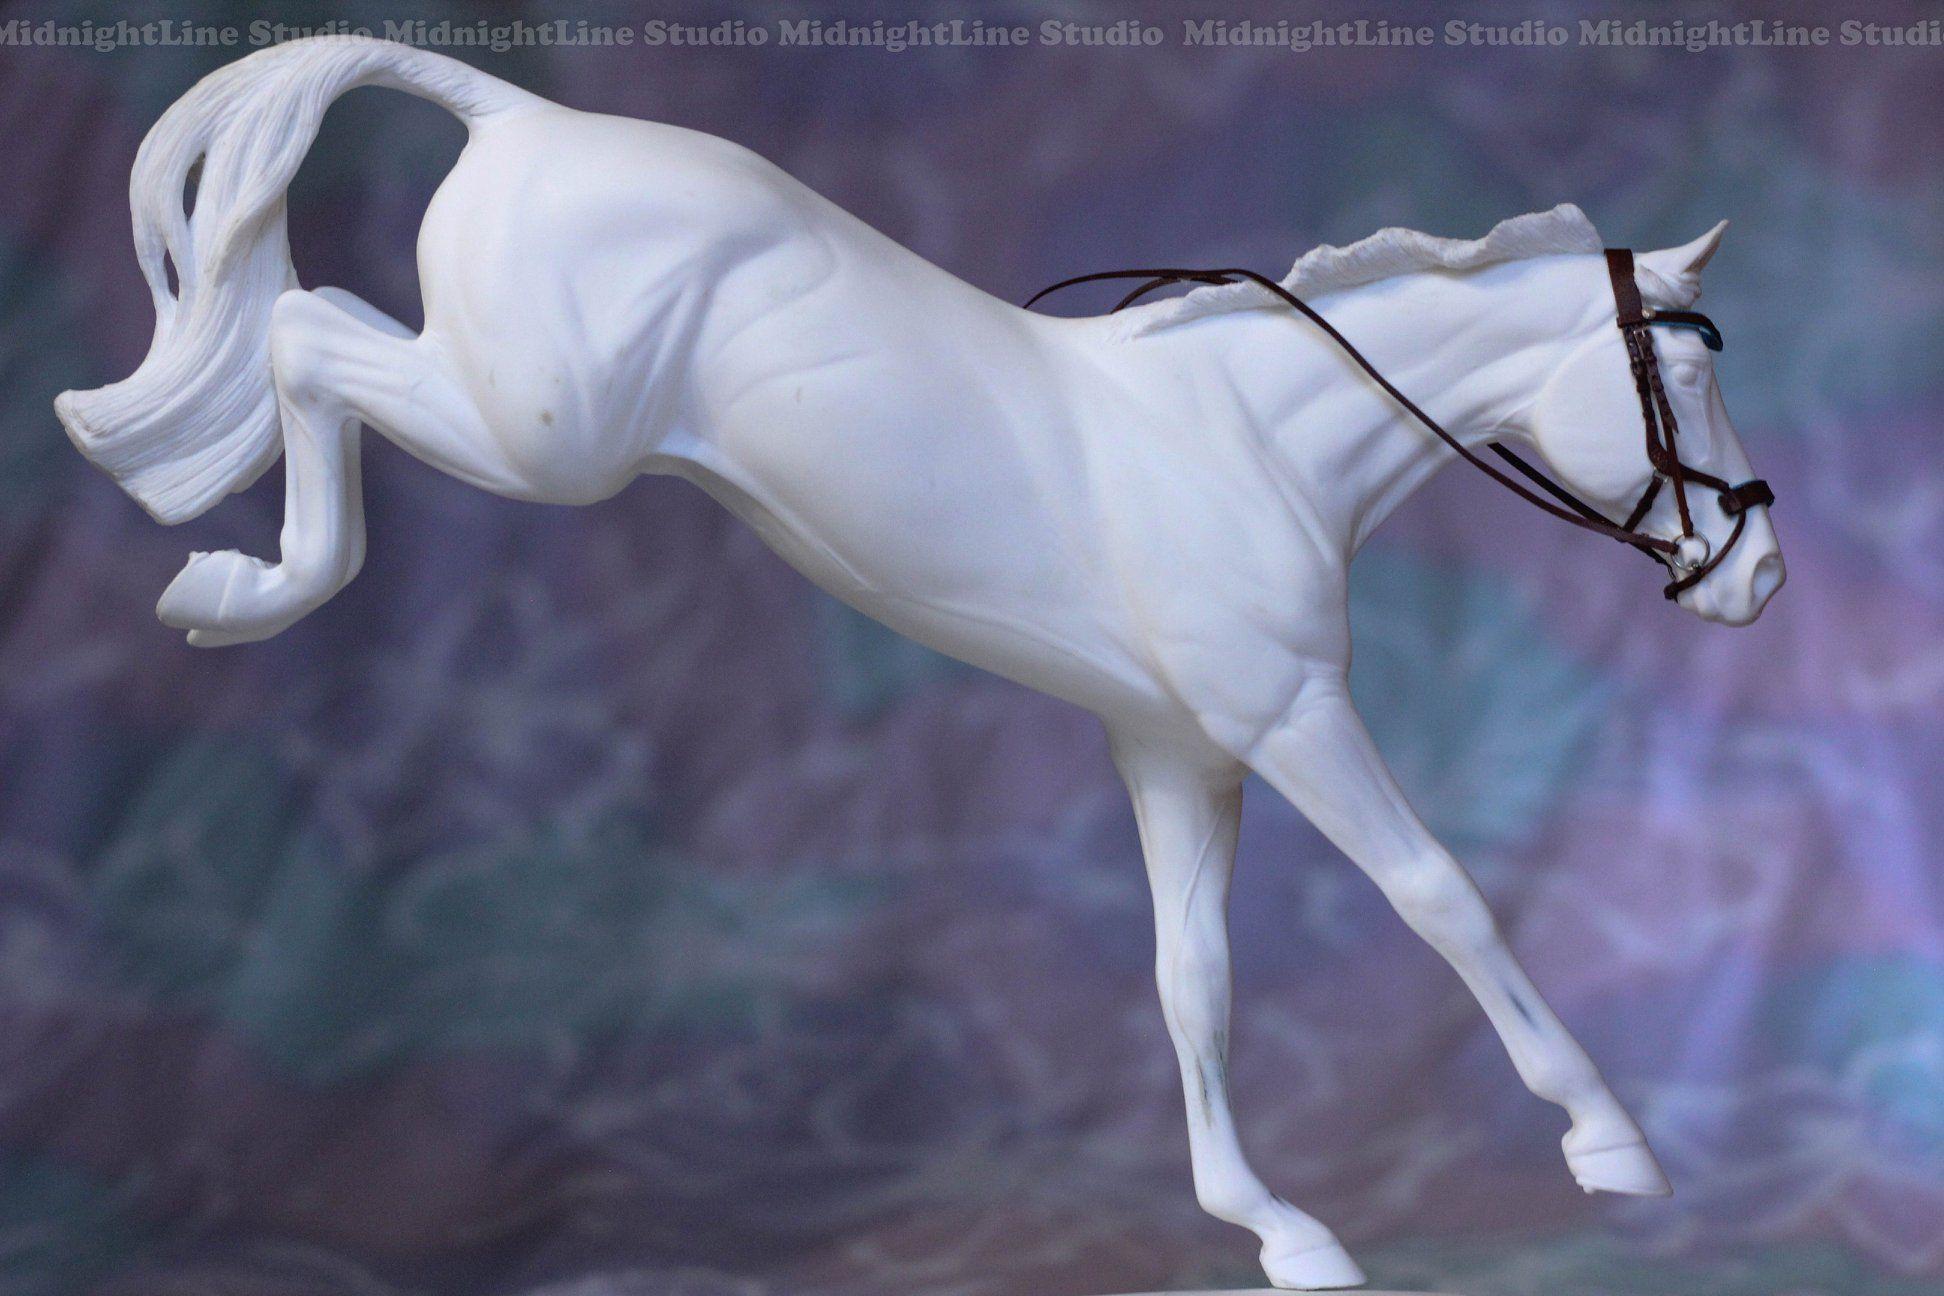 Model Horse Tack By Midnightline Studio Horses Horse Tack Pony [ 1296 x 1944 Pixel ]